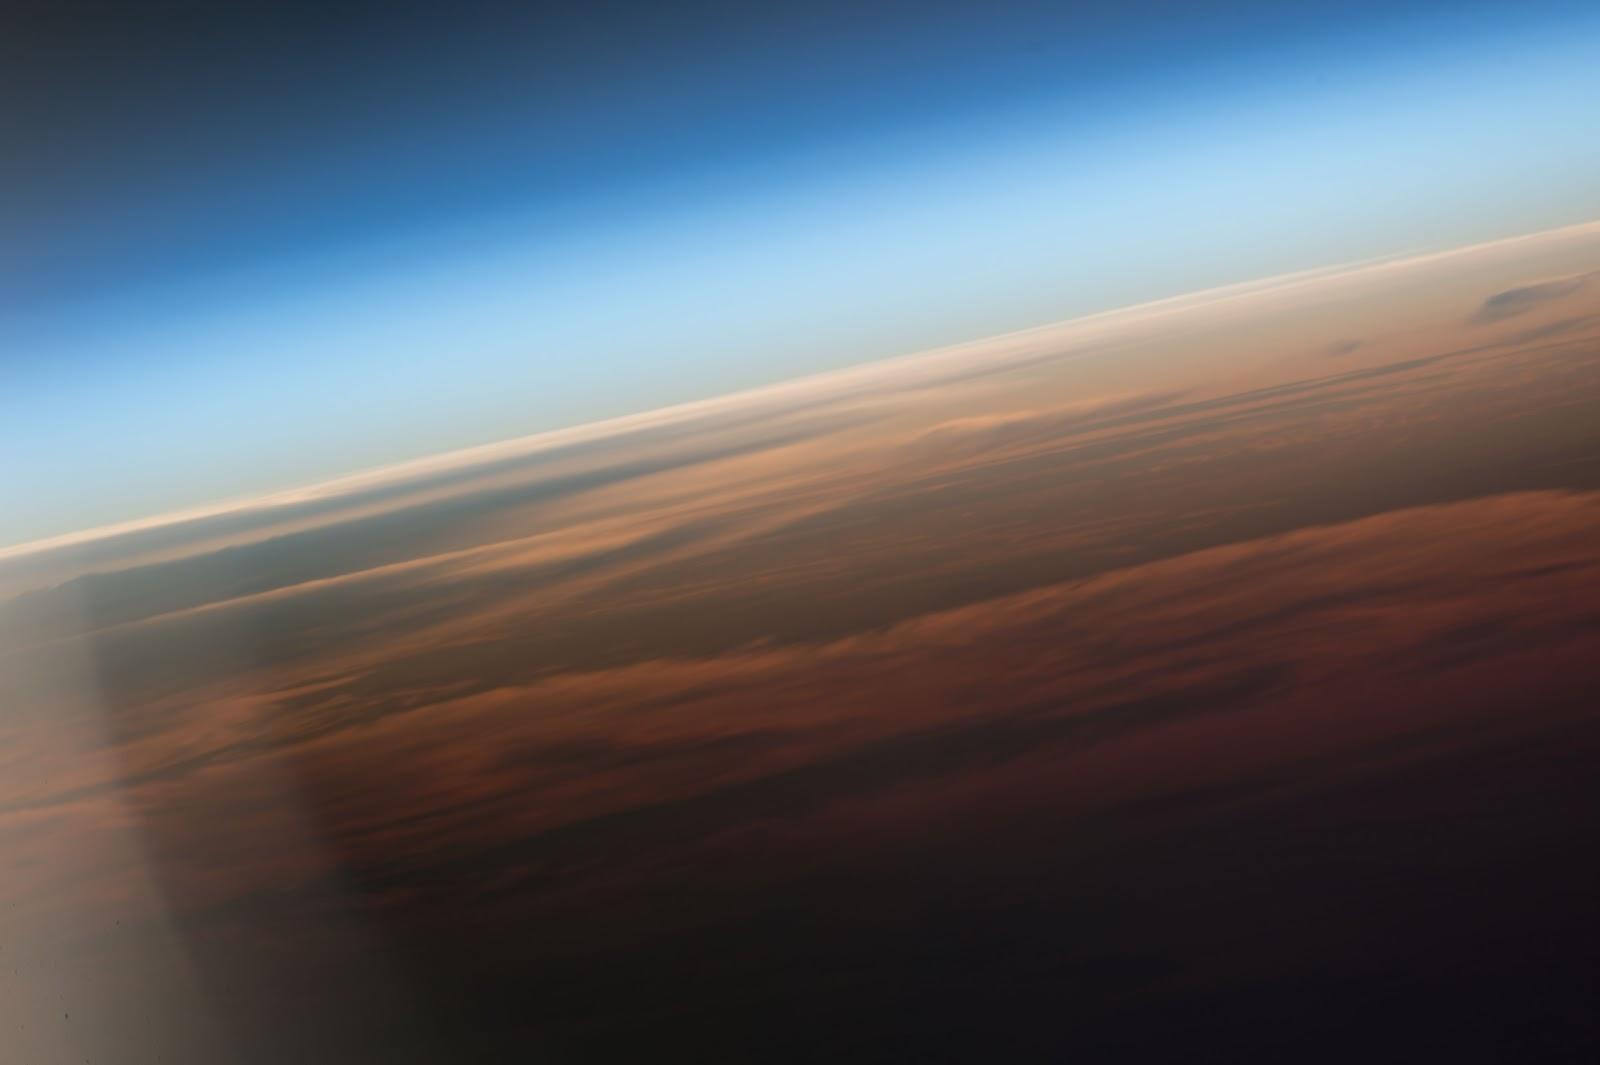 sunrise from international space station - photo #34